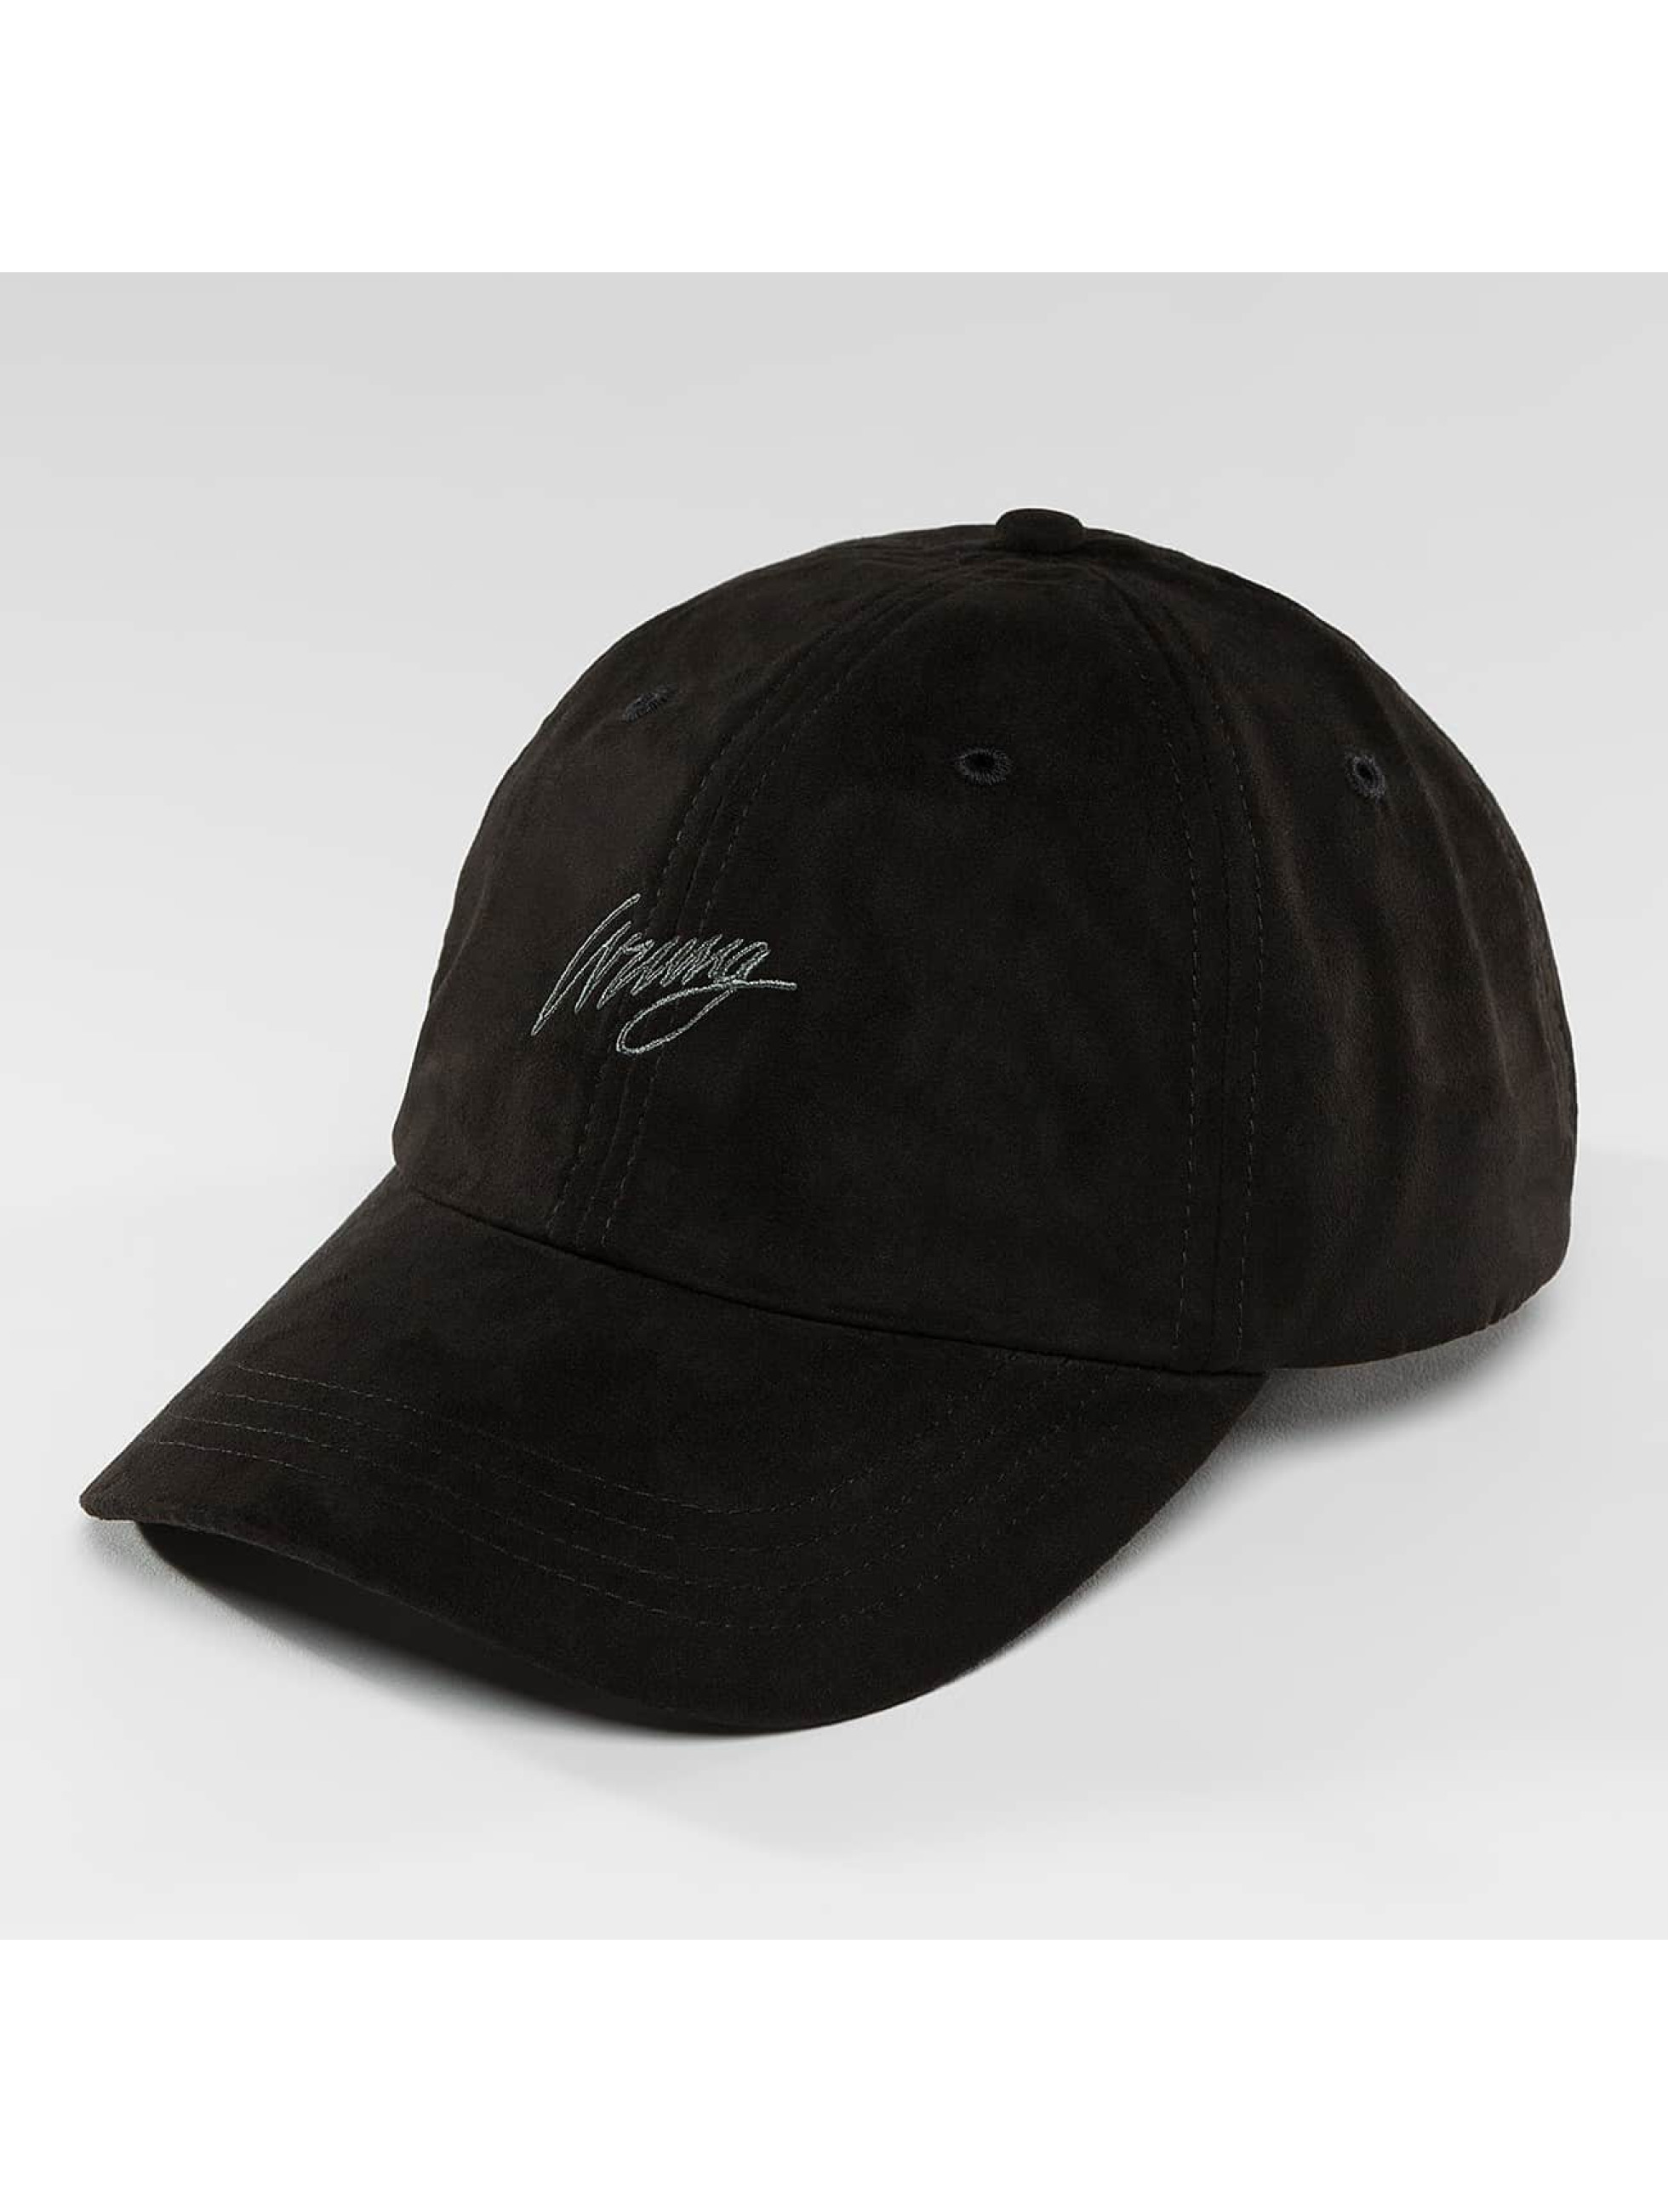 Wrung Division Casquette Snapback & Strapback Daim noir